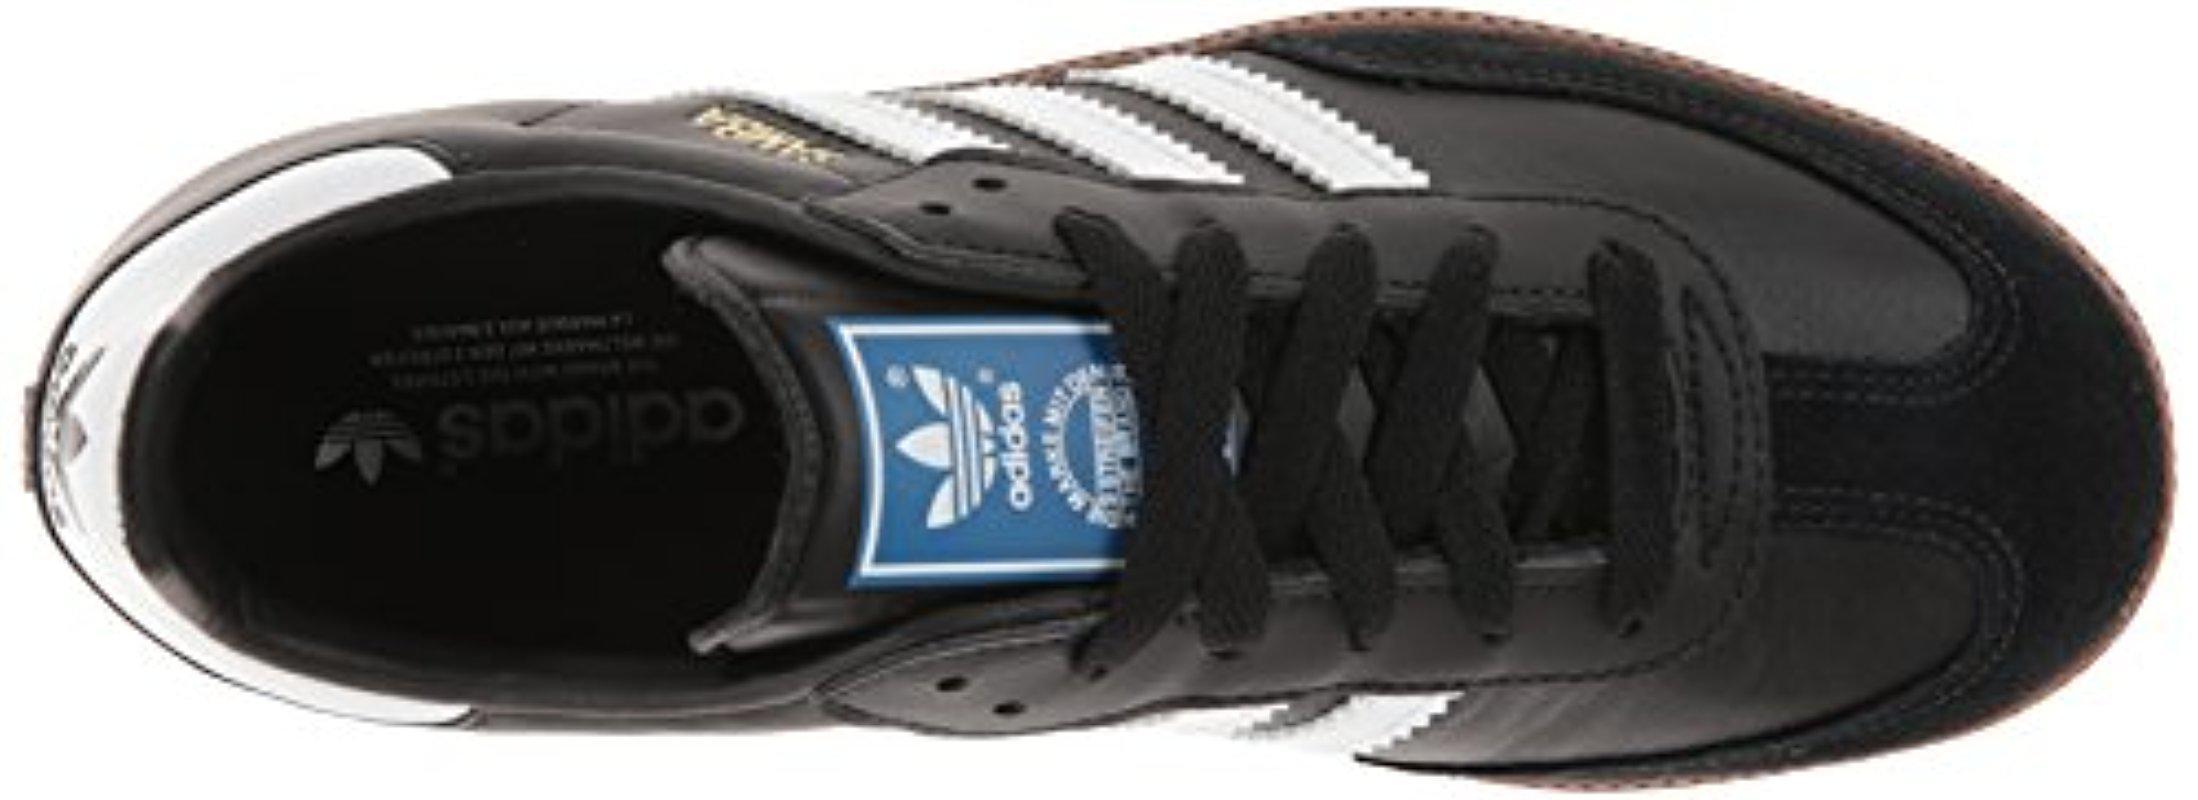 Lyst - Adidas Originals Samba Soccer-inspired Sneaker in Black for Men bb716d8bc